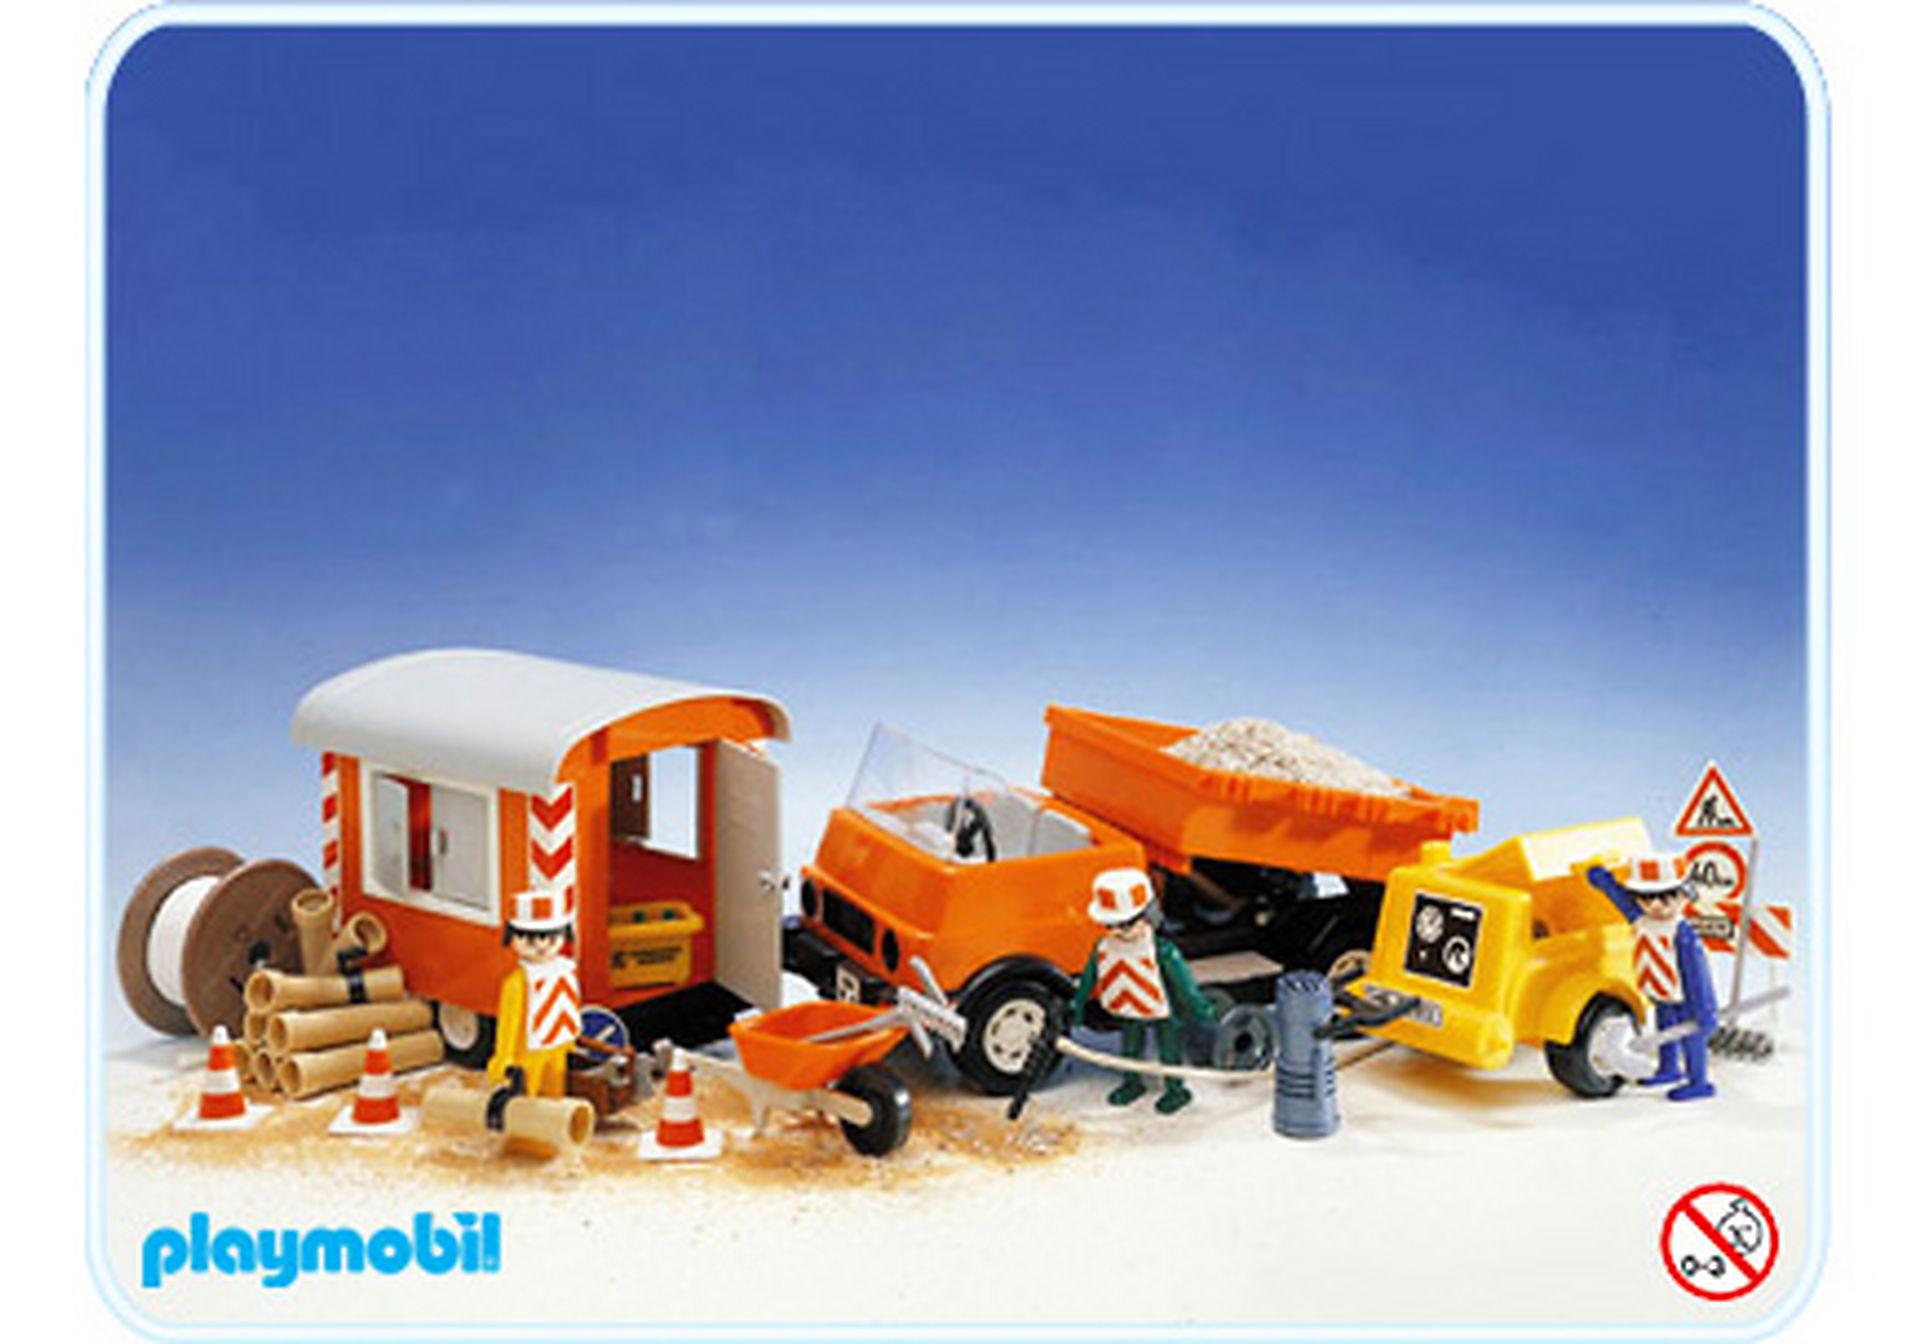 http://media.playmobil.com/i/playmobil/3474-A_product_detail/camion benne/compress.